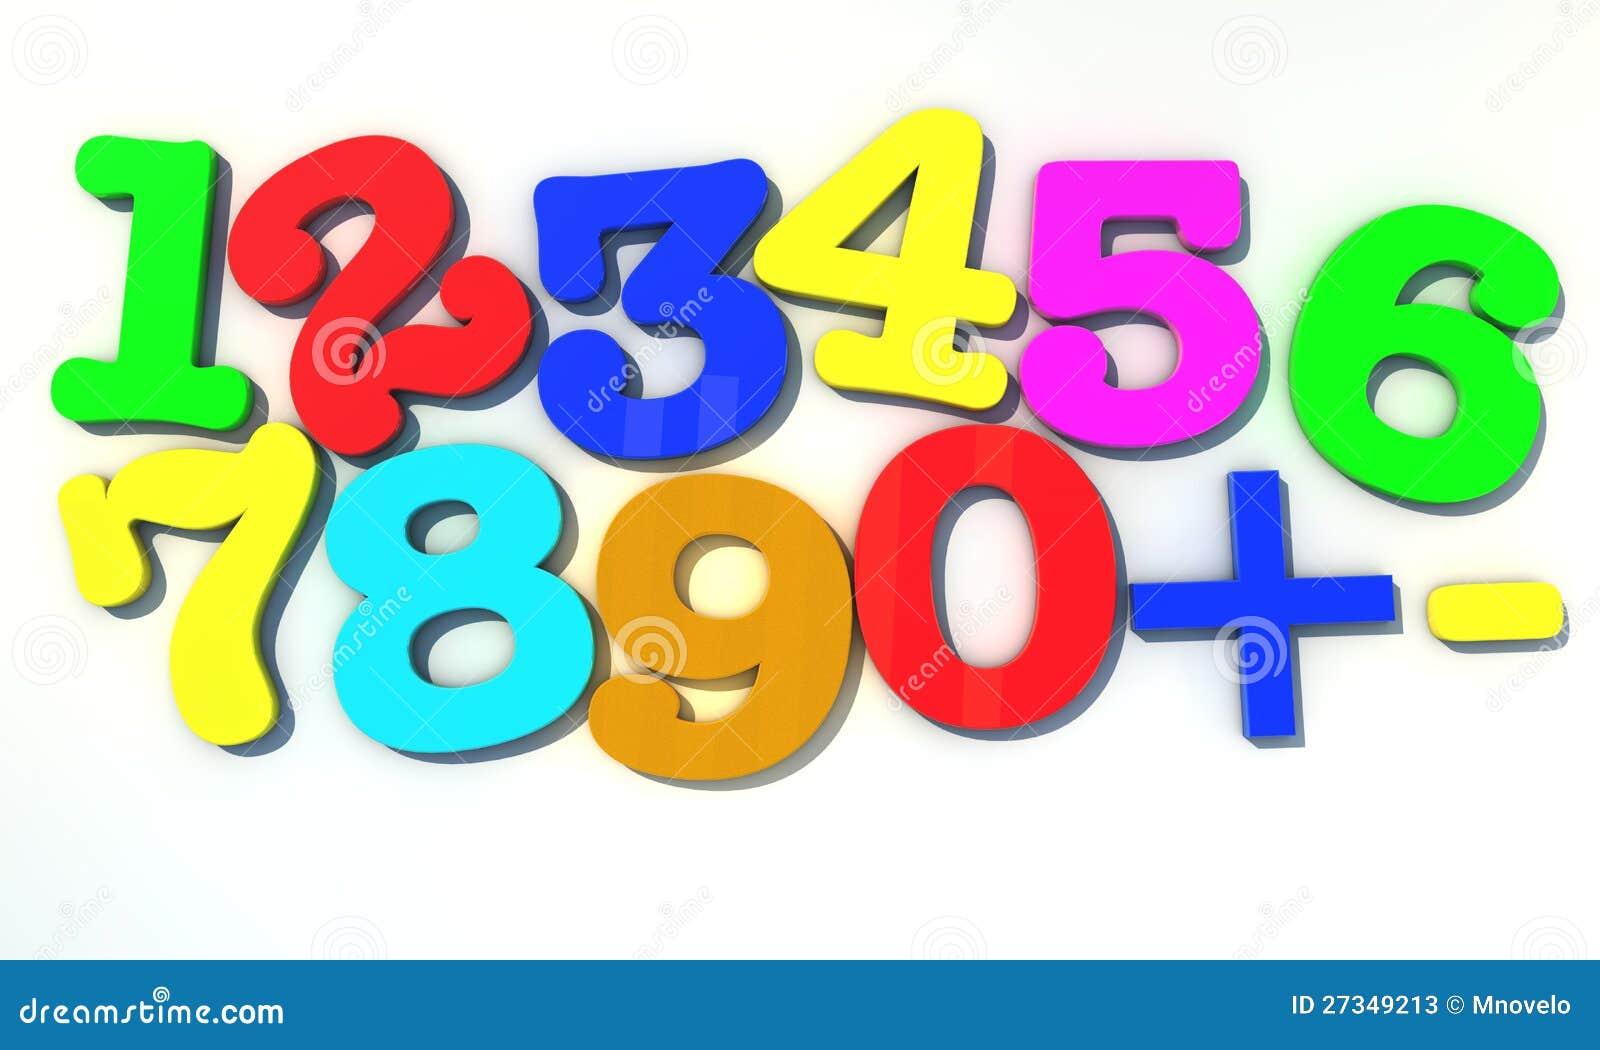 1234 Images 1234 stock illustrations – 201 1234 stock illustrations, vectors